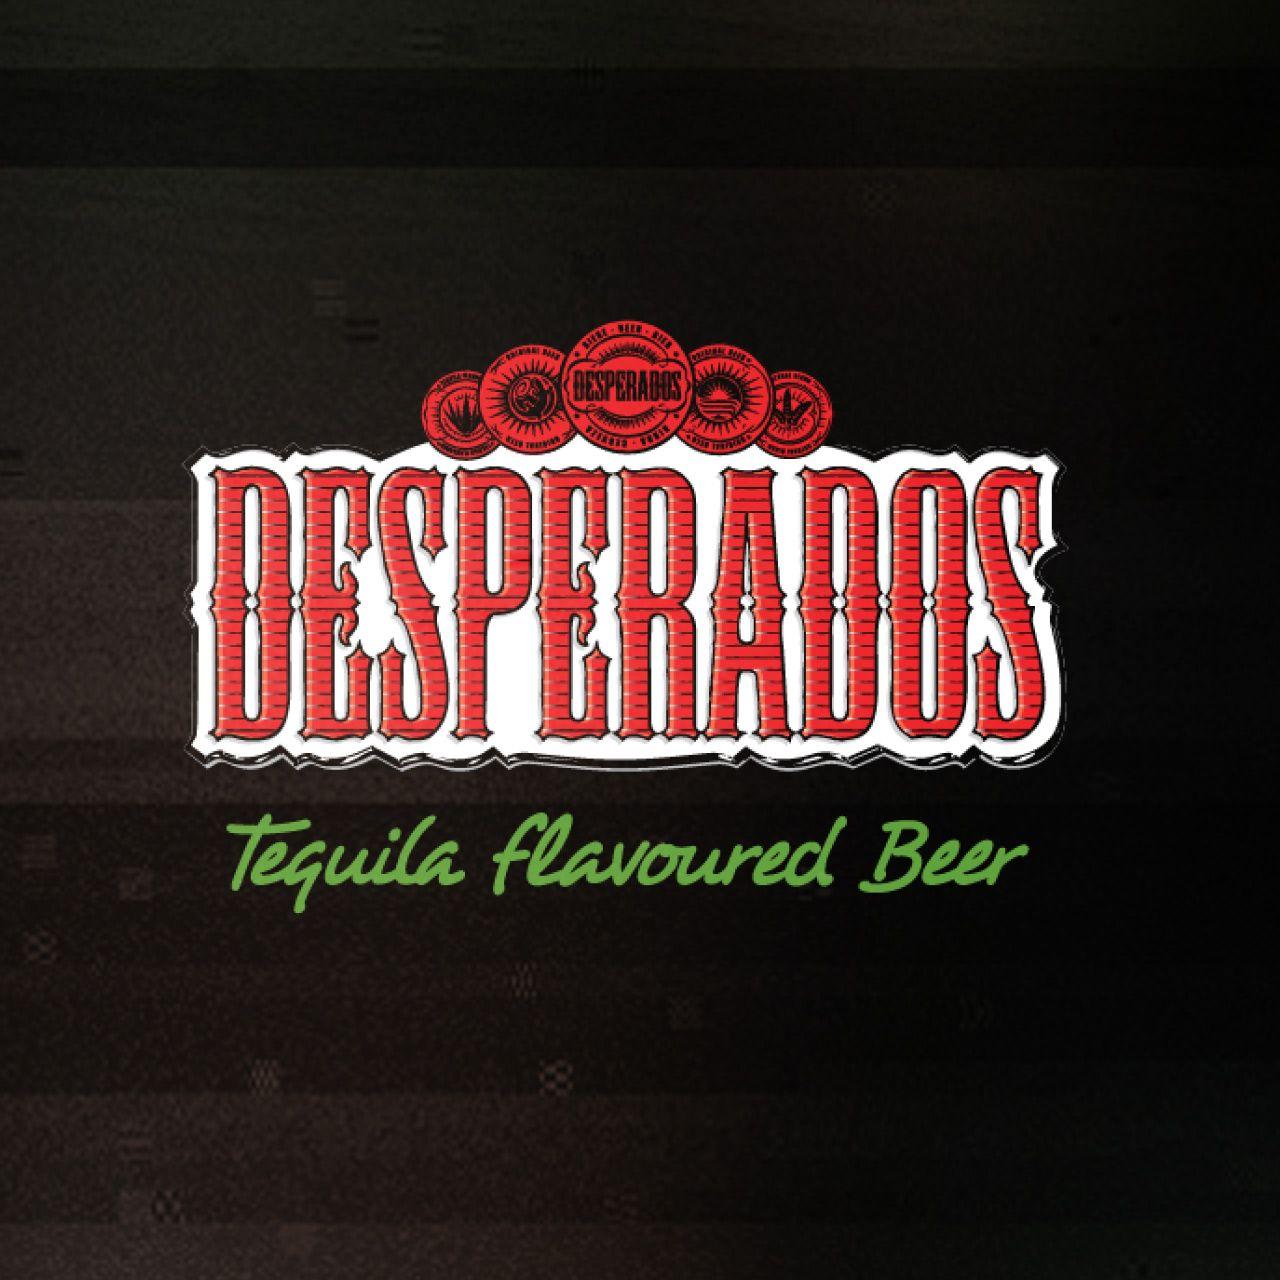 Desperados Tequila Flavoured Beer Flavored Beer Desperado Beer Flavors